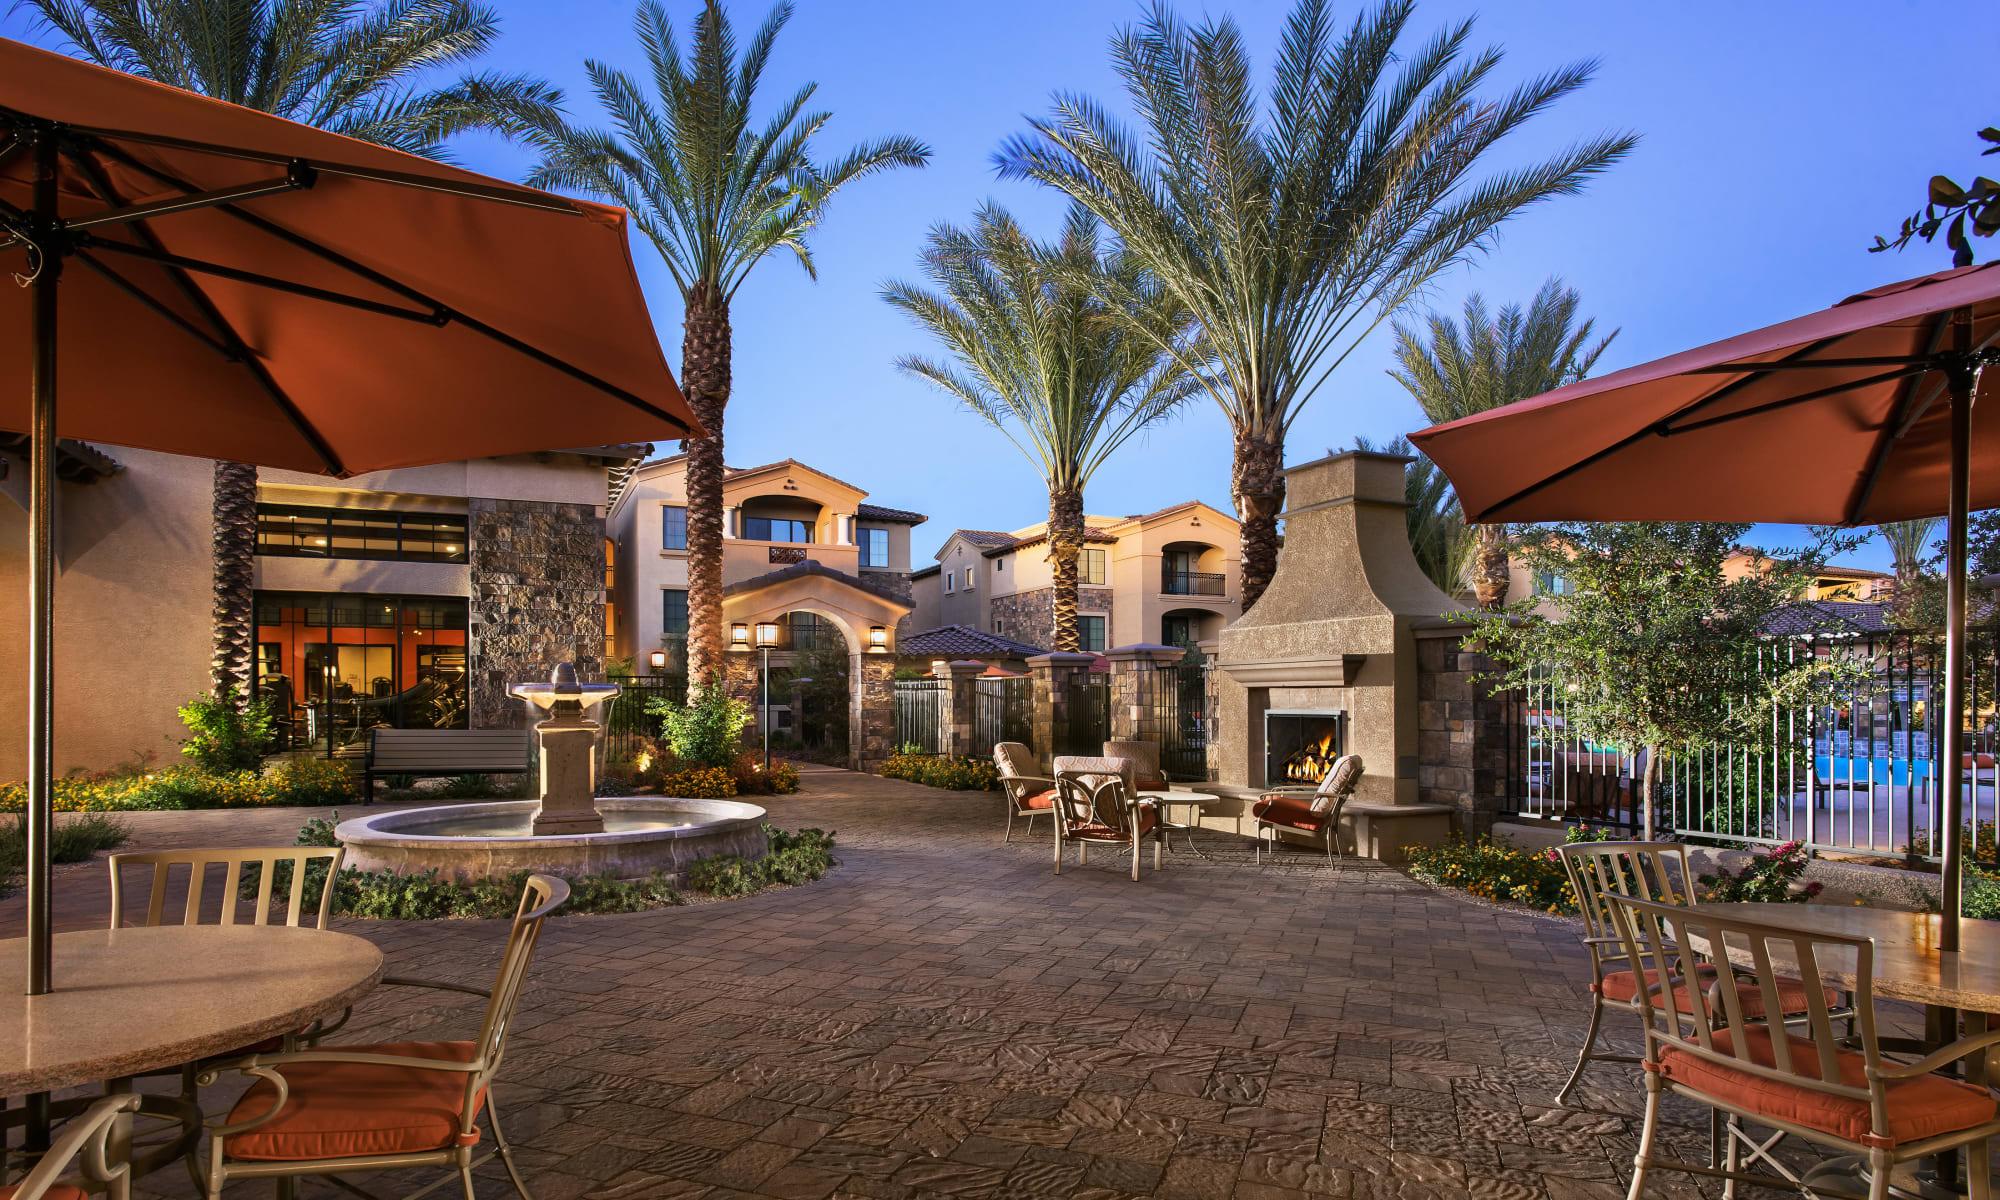 San Portales Apartments in Scottsdale, Arizona